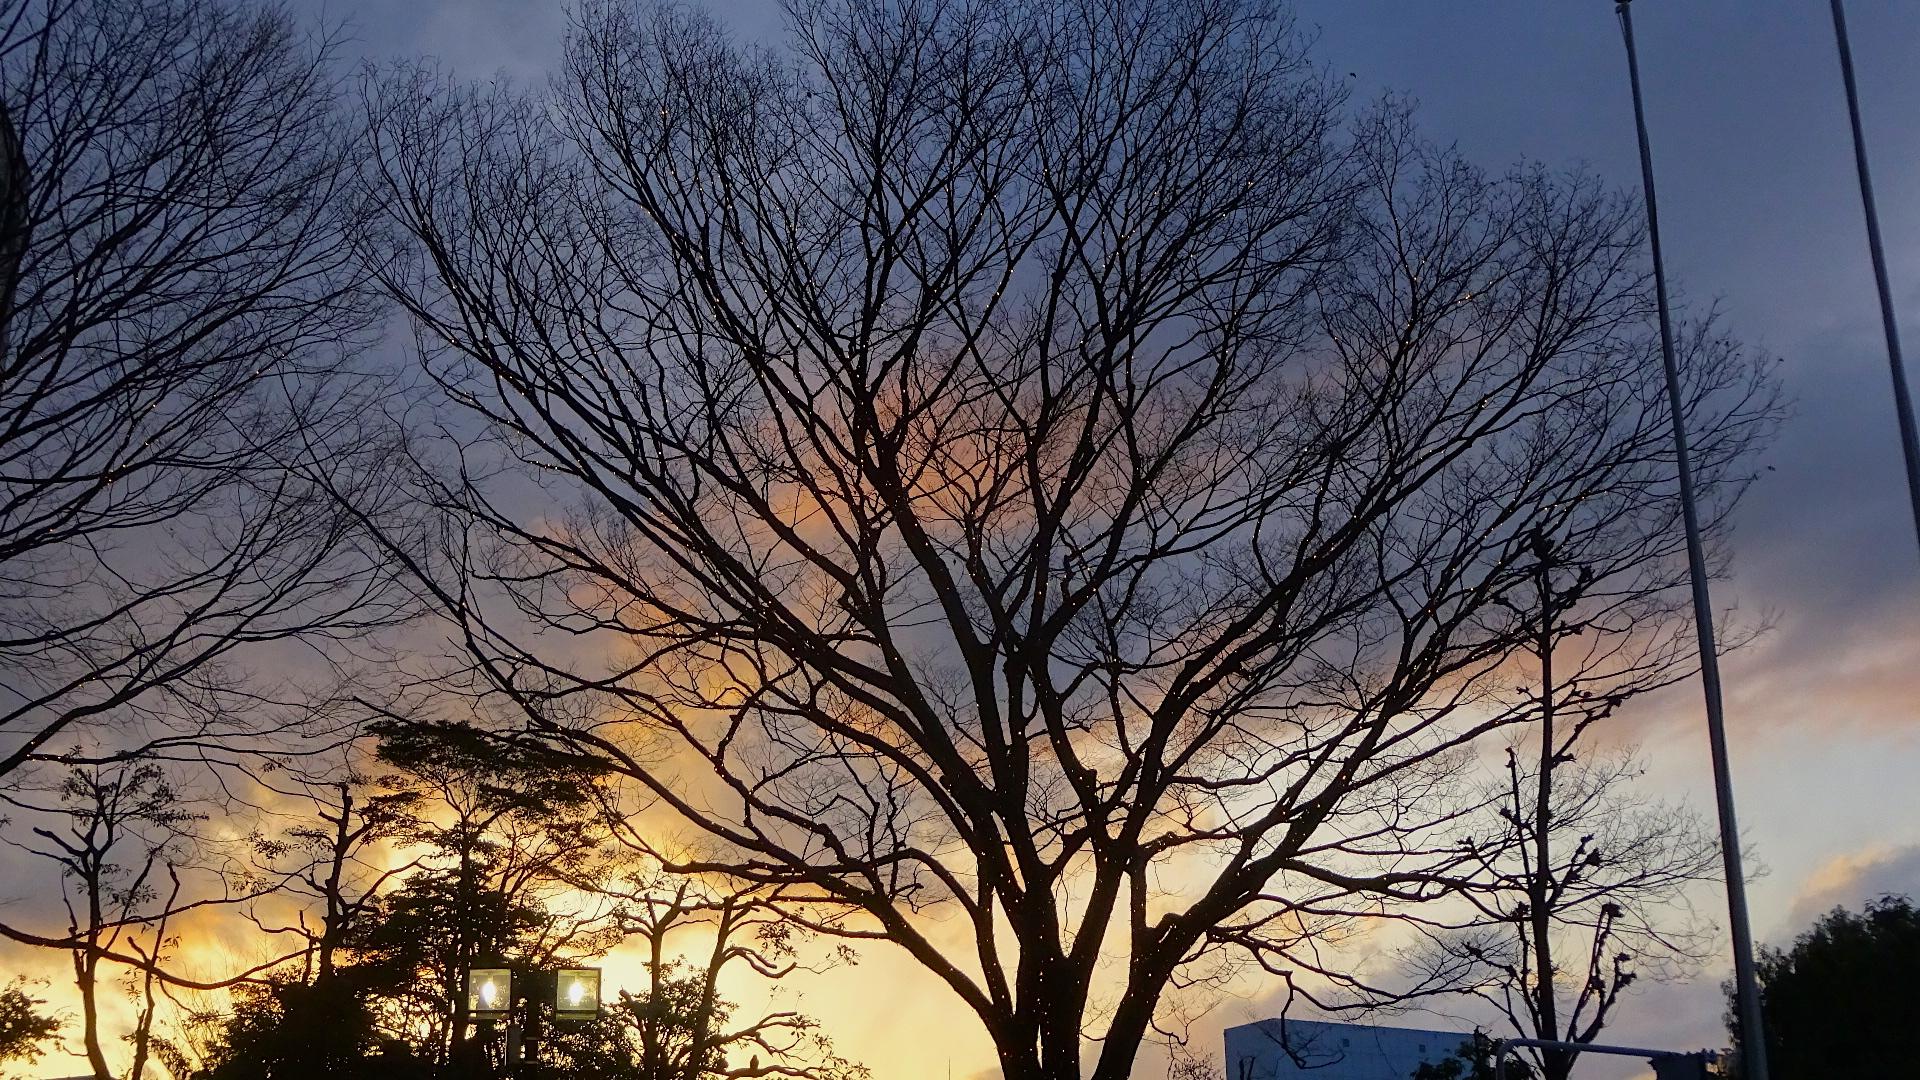 https://cdn-ak.f.st-hatena.com/images/fotolife/s/shioshiohida/20190316/20190316174931_original.jpg